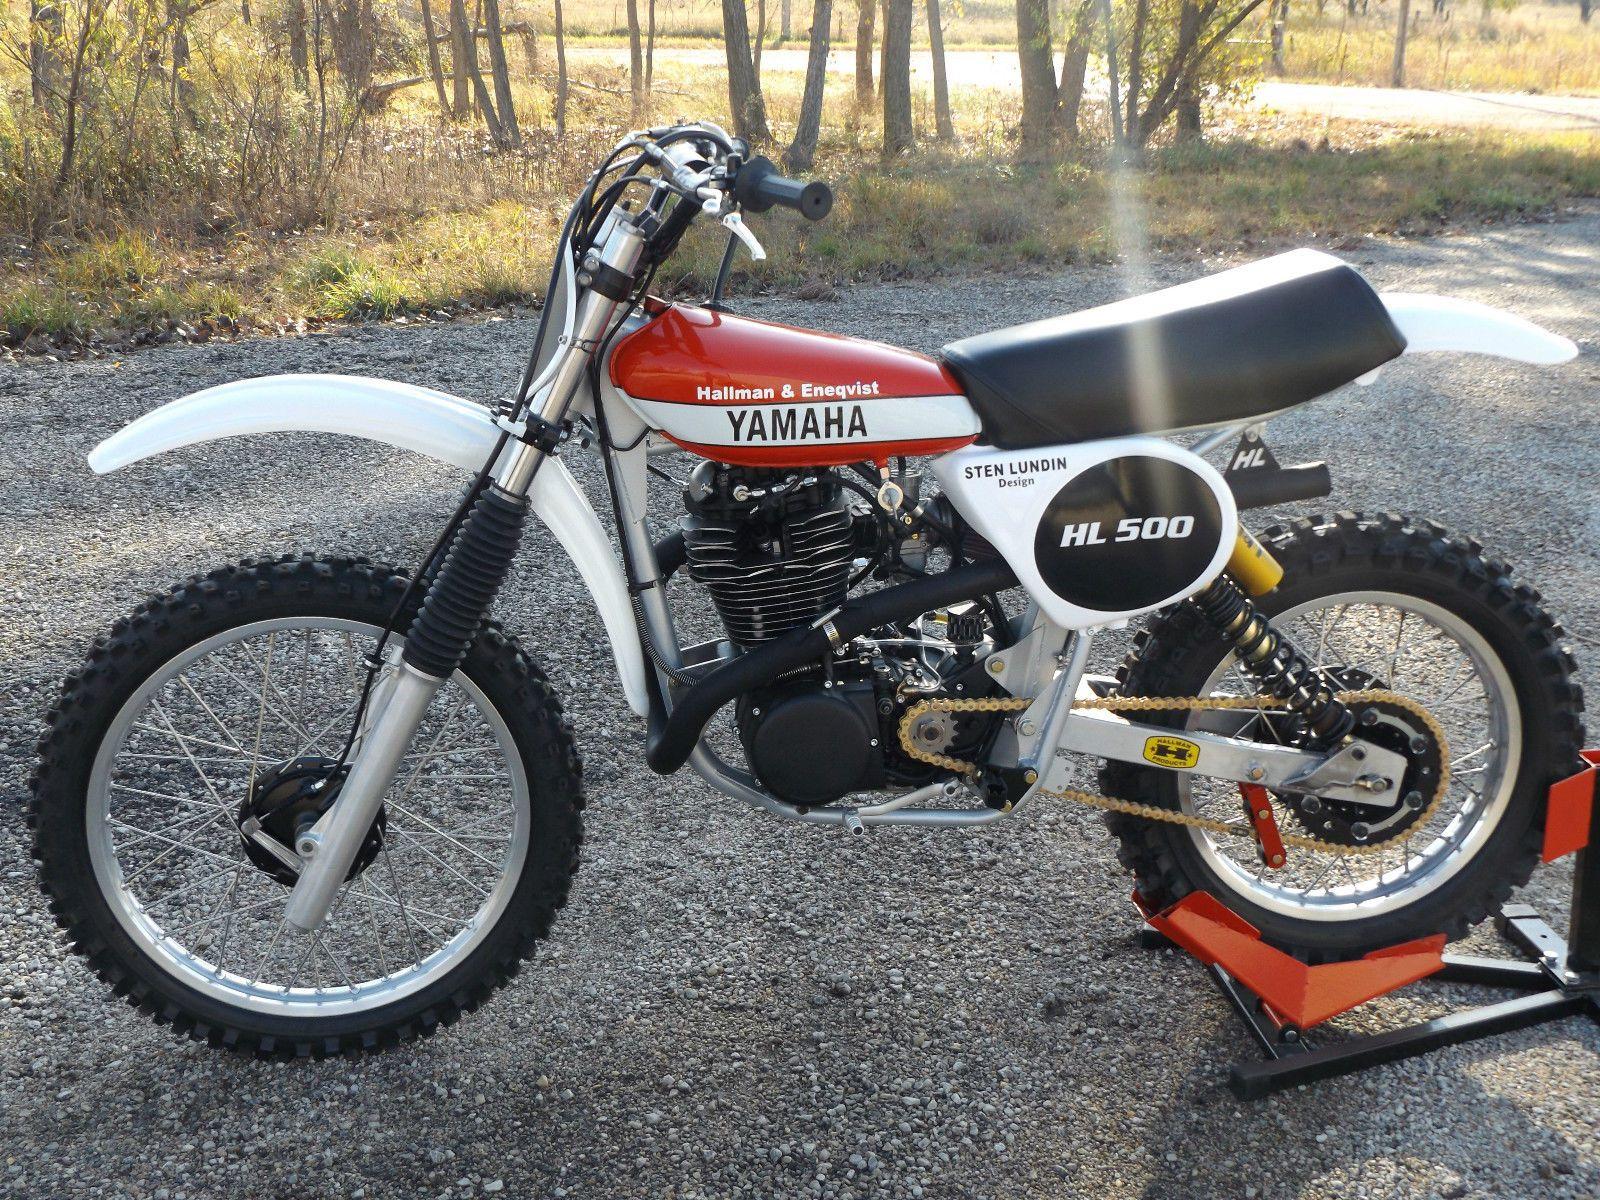 Bikes For Sale Yamaha Cafe Racer Yamaha Cafe Racer Motorcycle